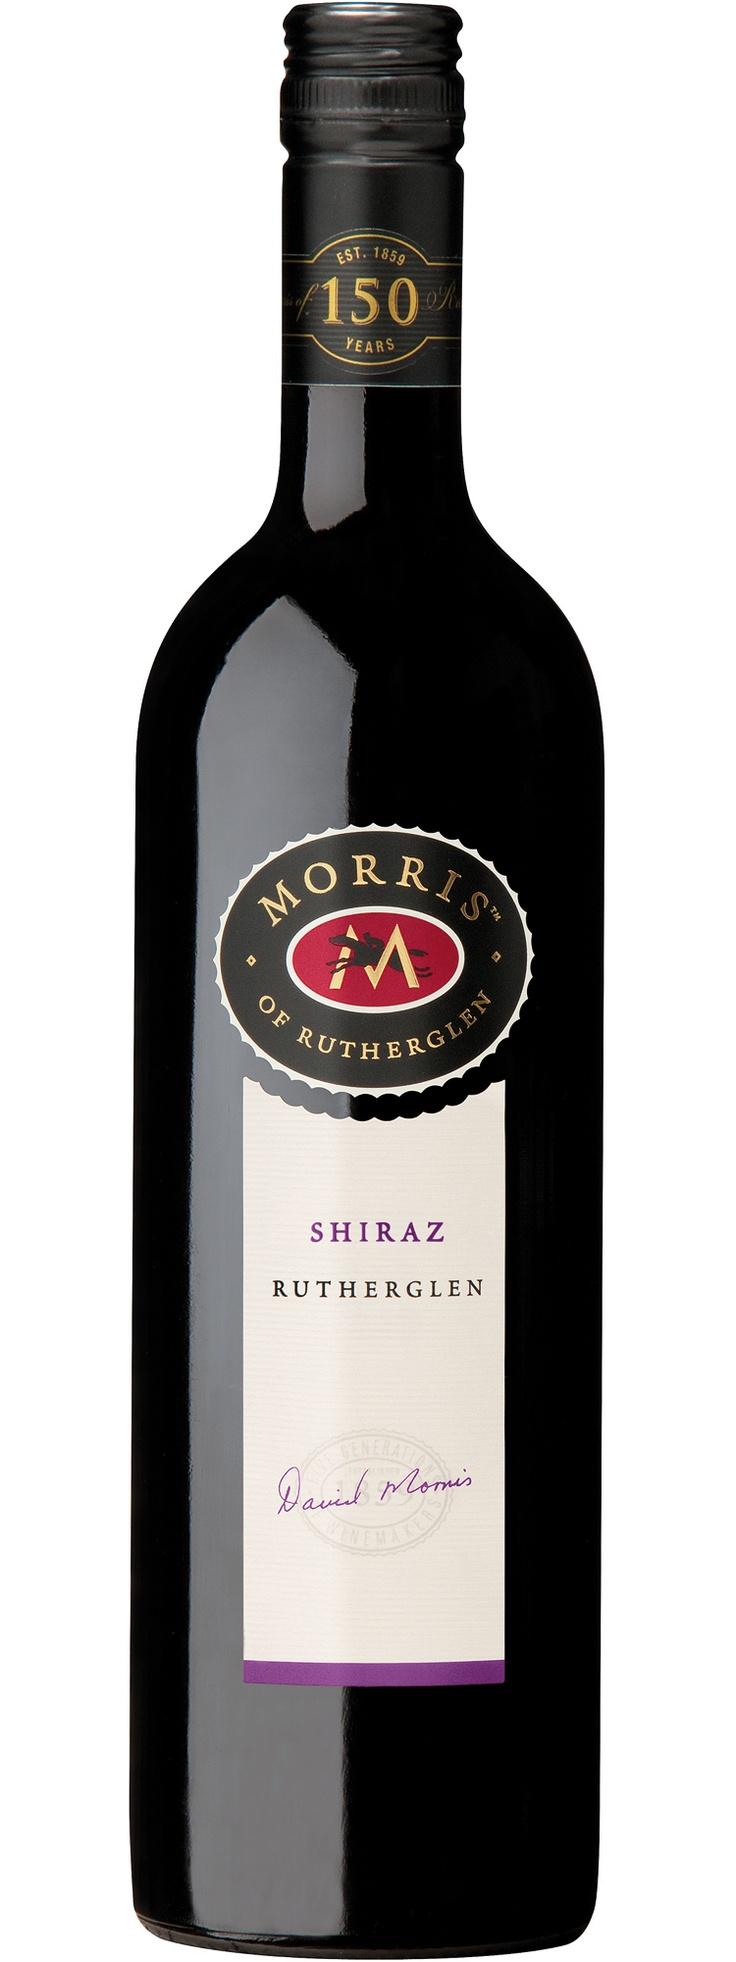 Morris Shiraz